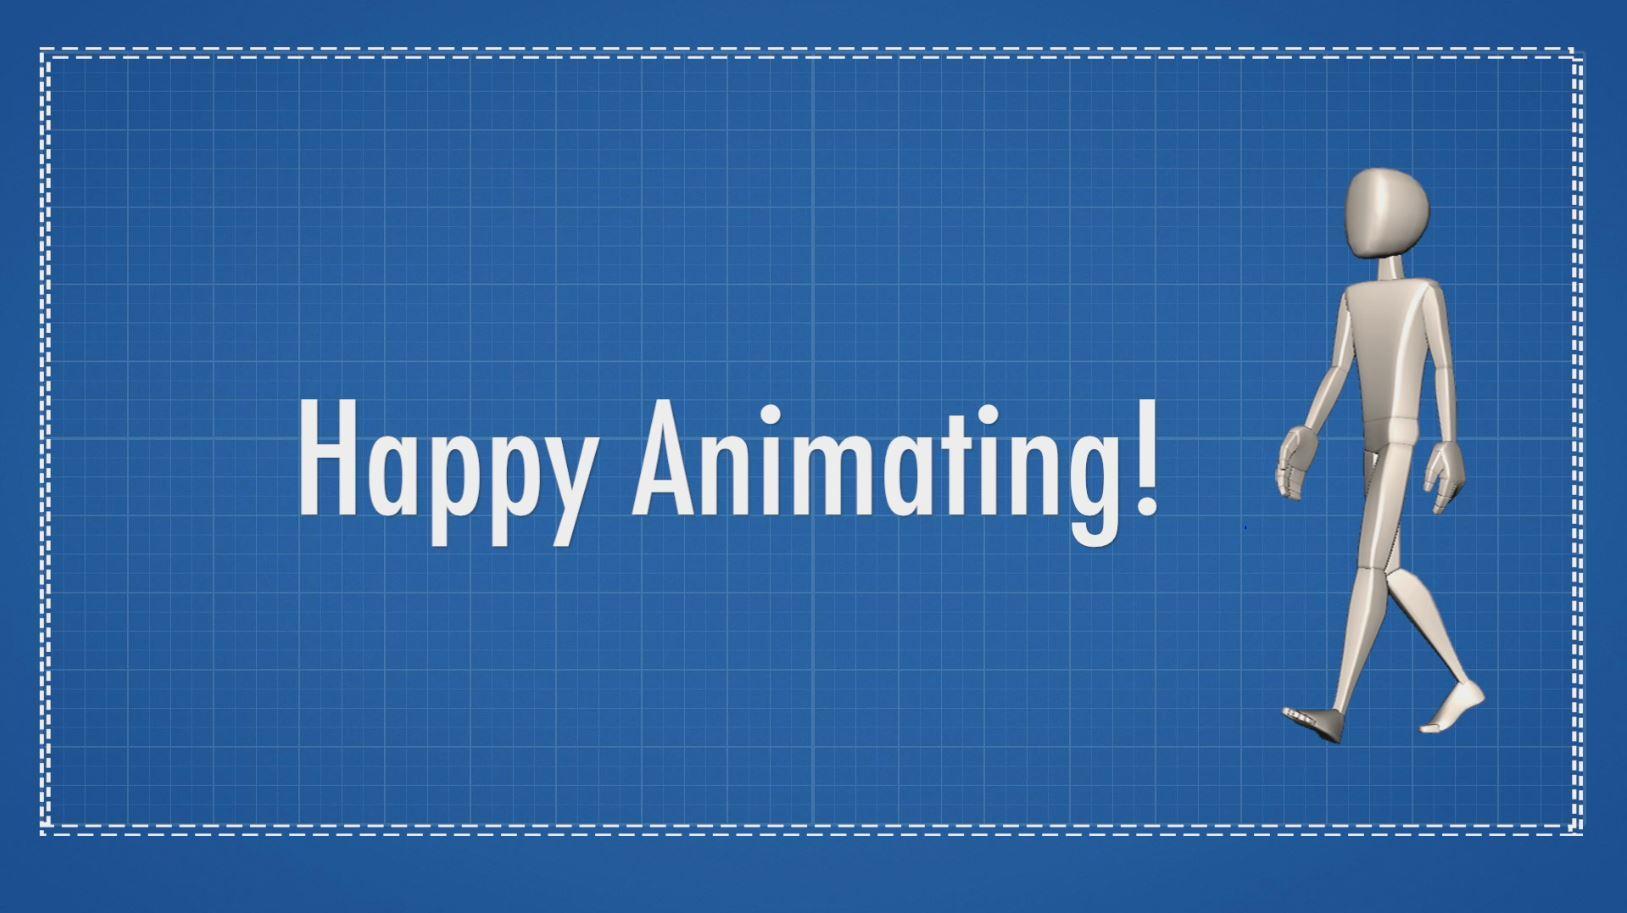 animation walk cycle happy animating